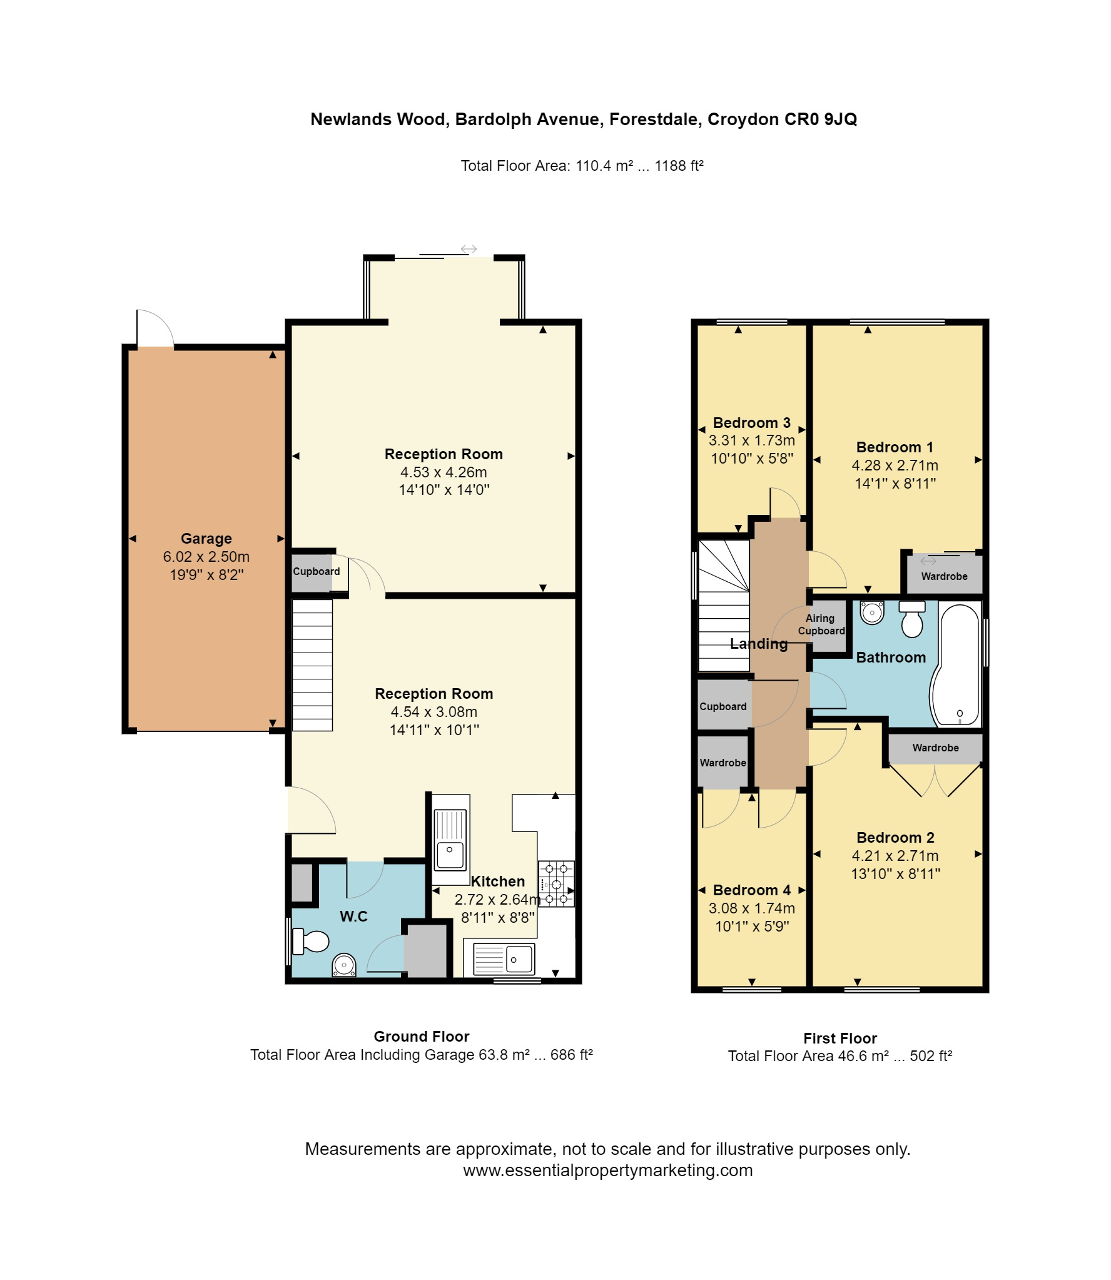 Floorplan of Newlands Woods, Bardolph Avenue, Croydon, CR0 9JQ